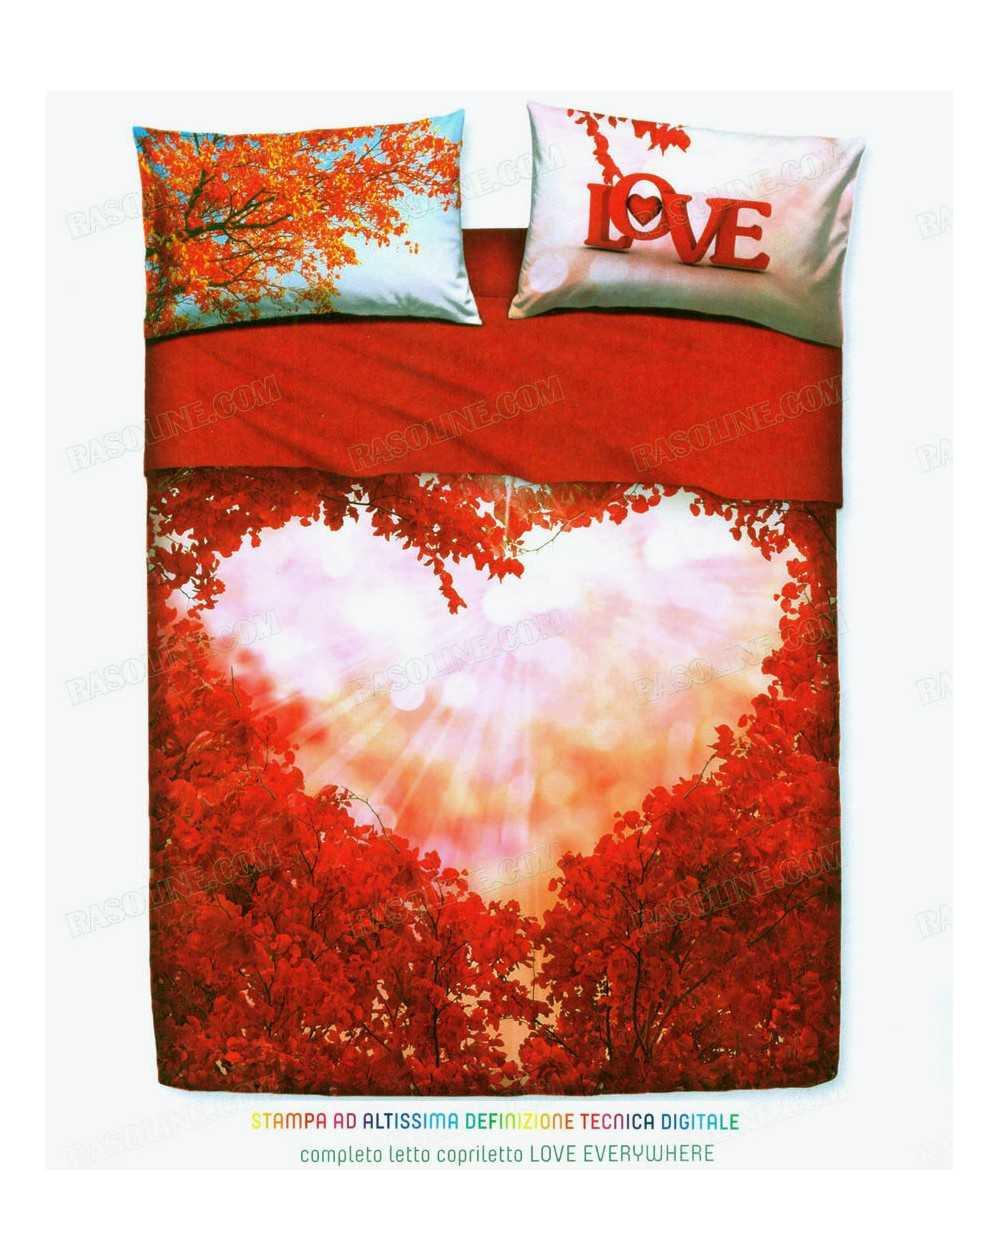 Letto Completo Matrimoniale.Completo Lenzuola Letto Matrimoniale Love Everywhere By Bassetti Rosso